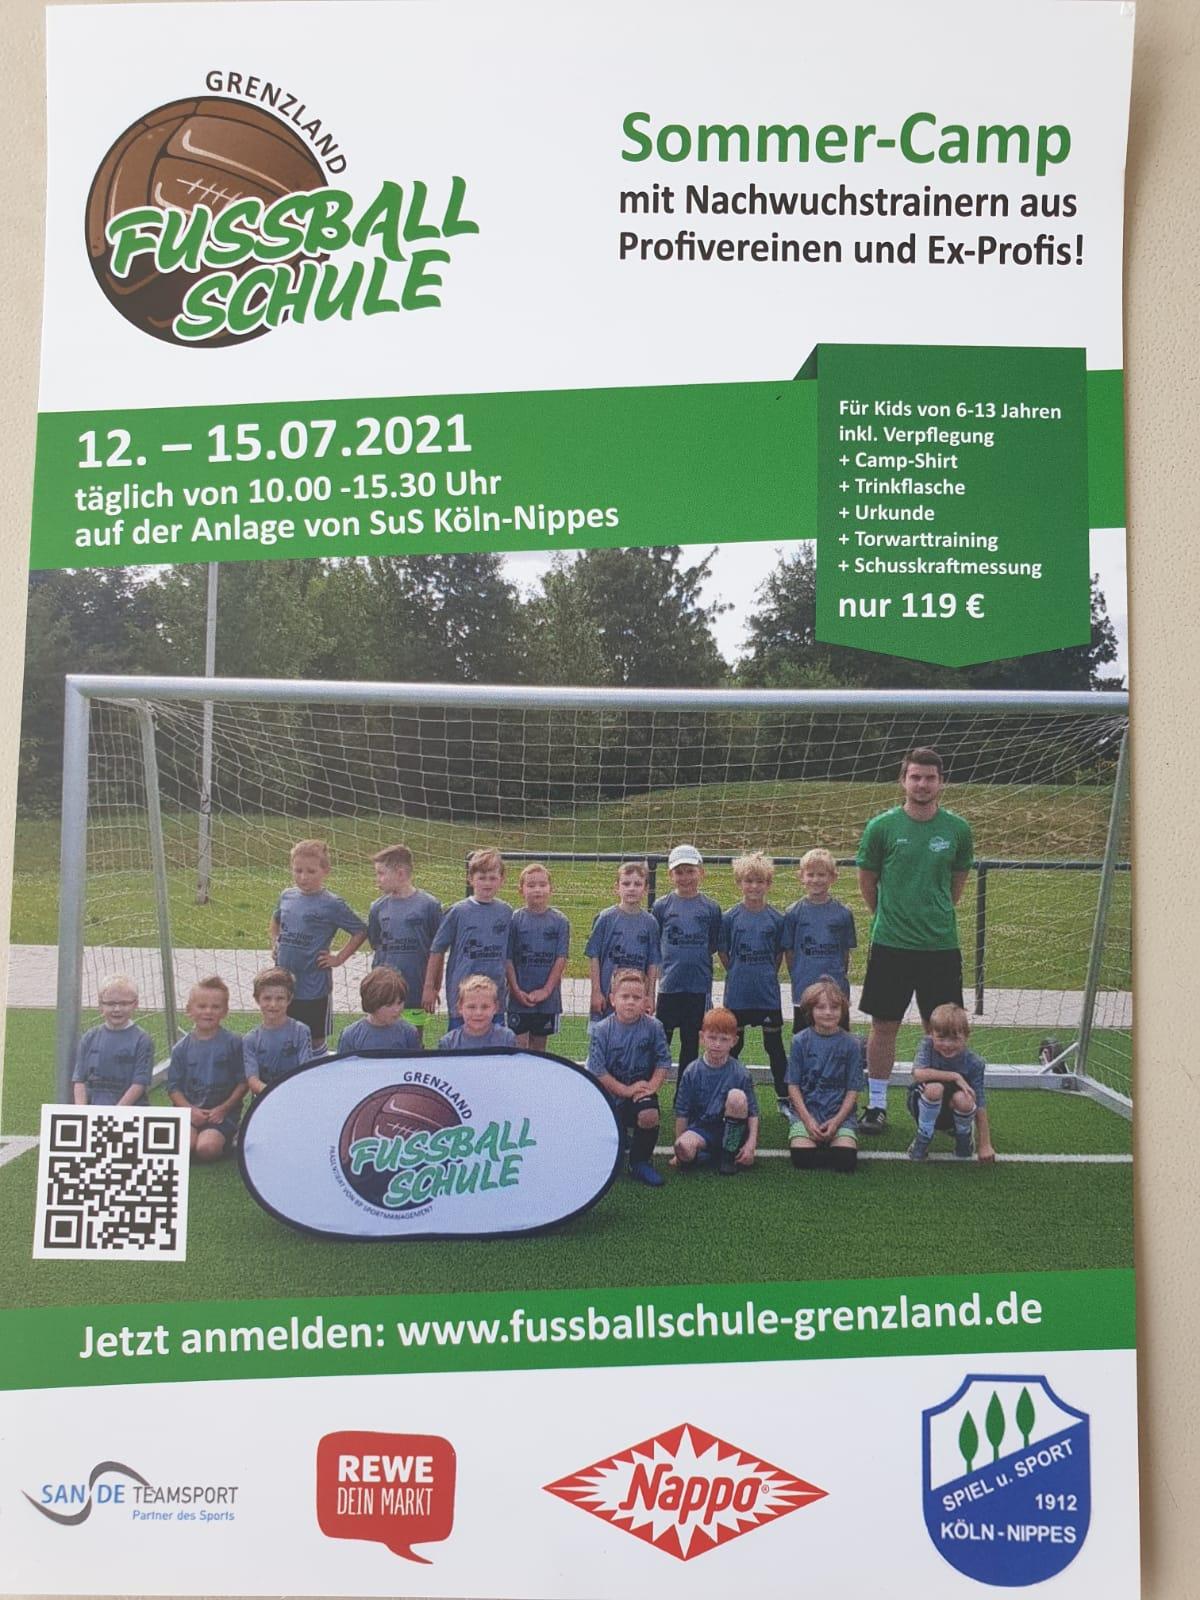 Fussballschule Sommer-Camp